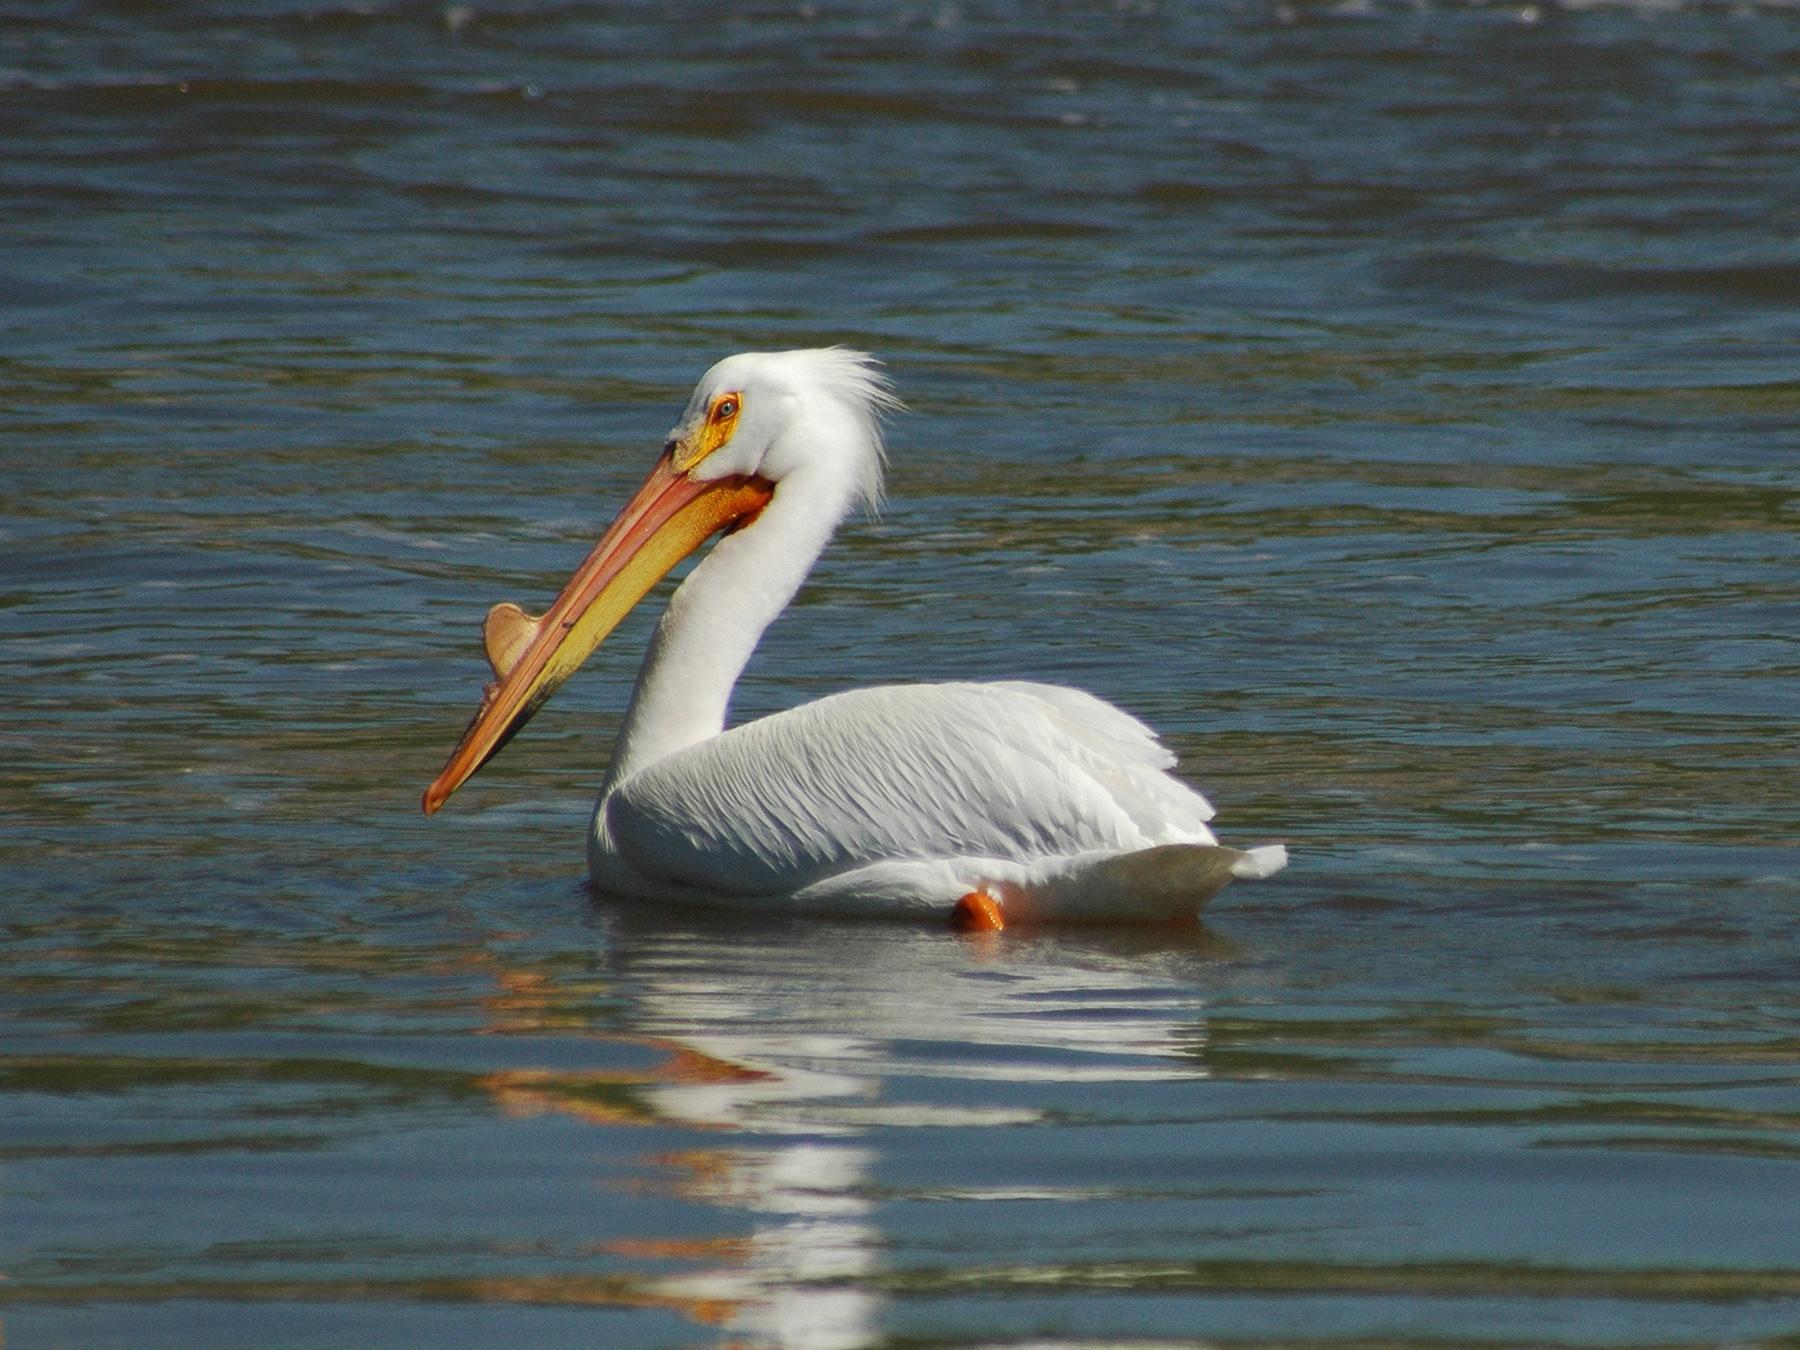 White Pelican in the Gulf of Mexico. Credit: U.S. Dept. of Interior